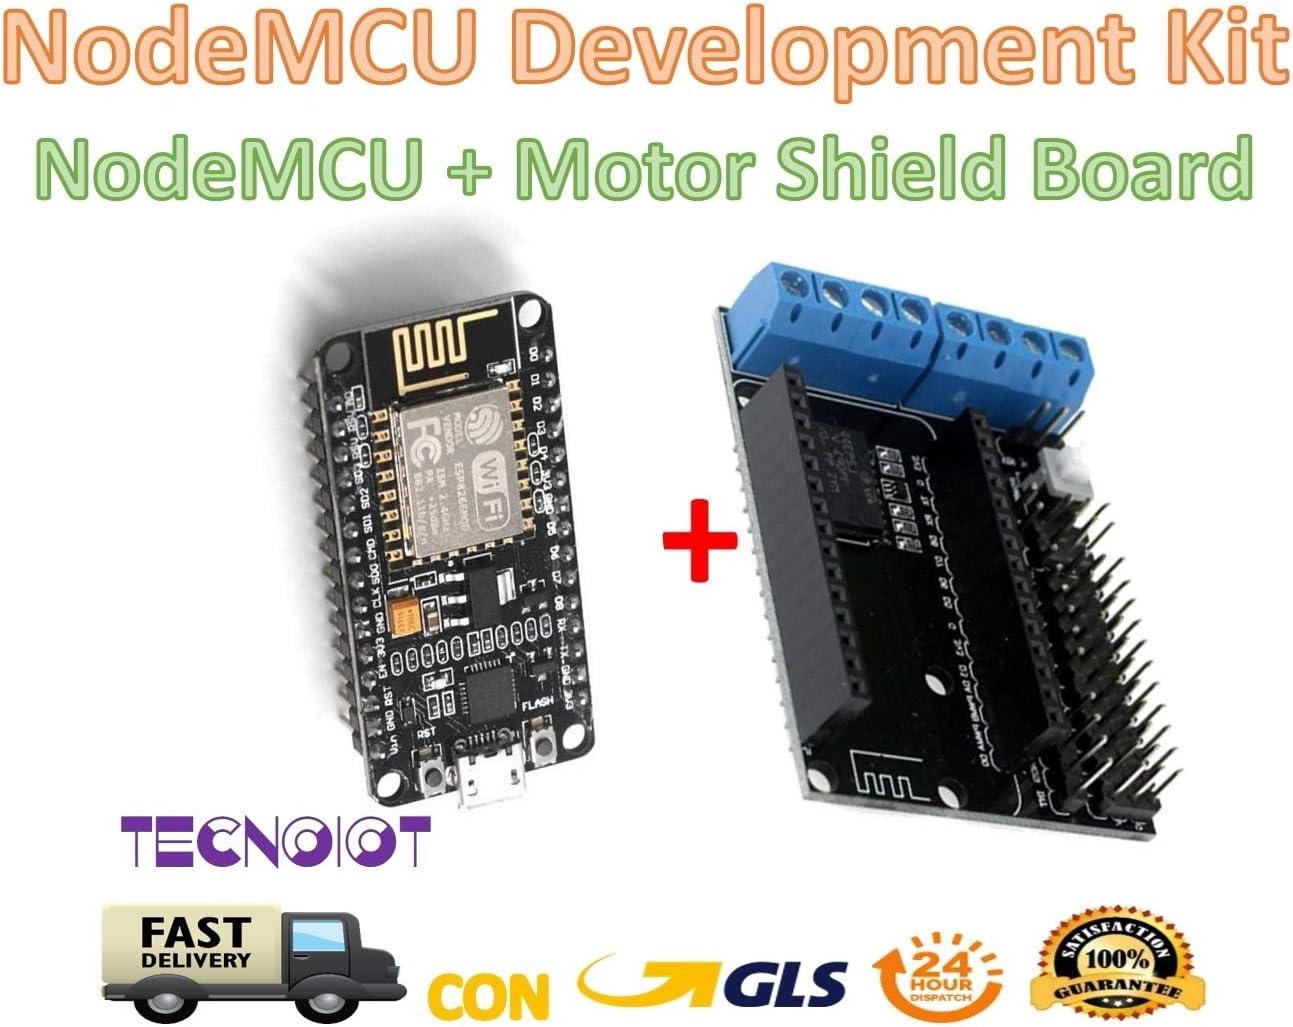 ARCELI ESP8266 ESP-12E NodeMcu Lua CP2102 WiFi Junta de Desarrollo inal/ámbrico en Serie Micro USB a TTL IOT y L293D Tarjeta de expansi/ón del Motor M/ódulo de Escudo para Arduino